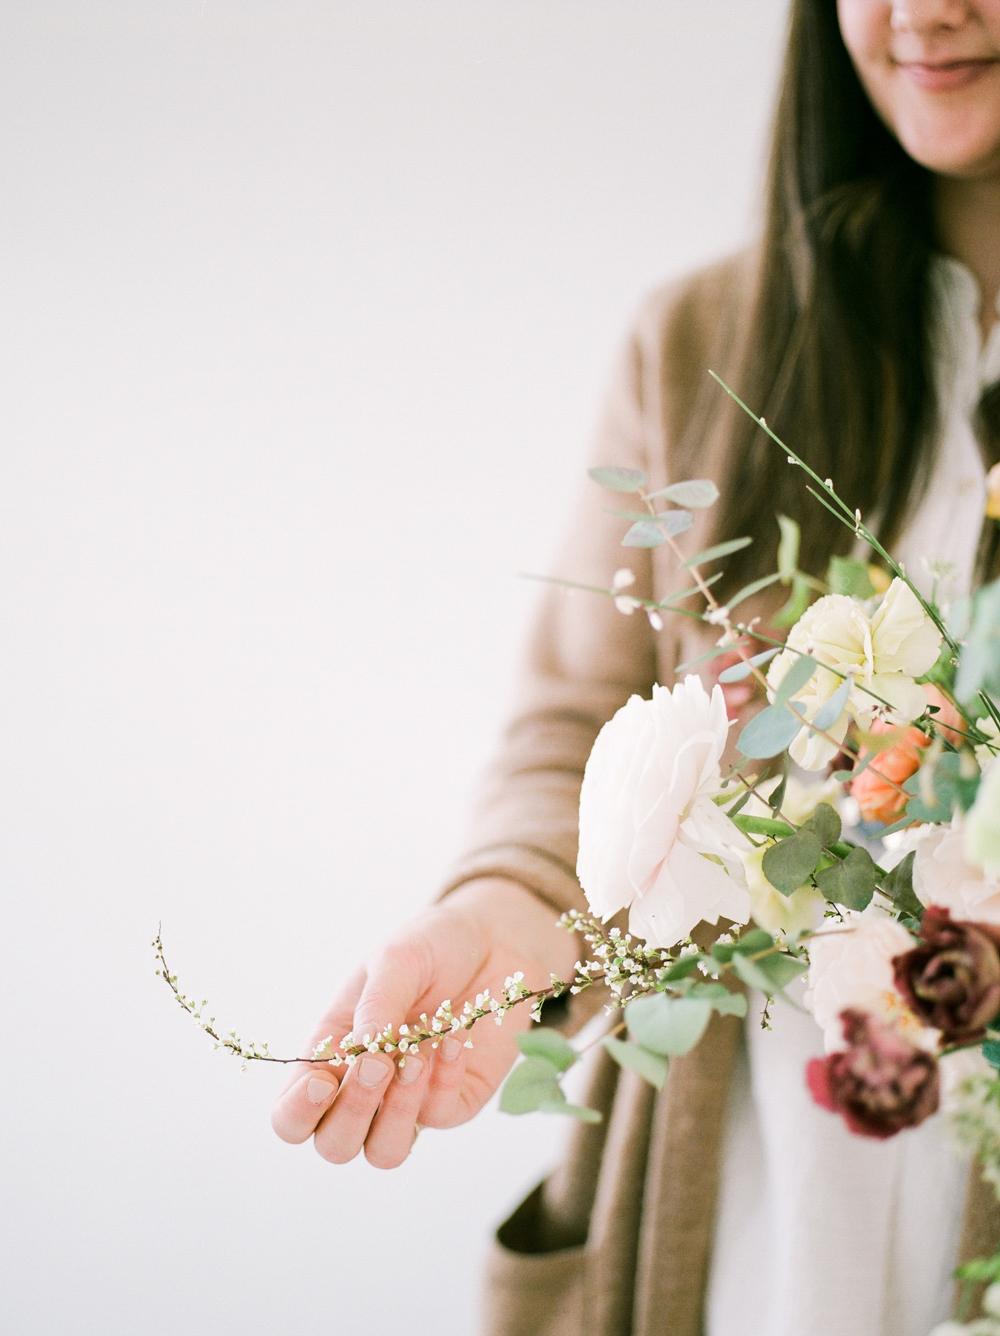 Christine-Gosch-Lexie-Sandberg-Carpe-diem-flowers-florals-design-wedding-flowers-salt-lake-city-branding-photos-styling-bridal-bouquet-centerpieces-film-photographer-8.jpg